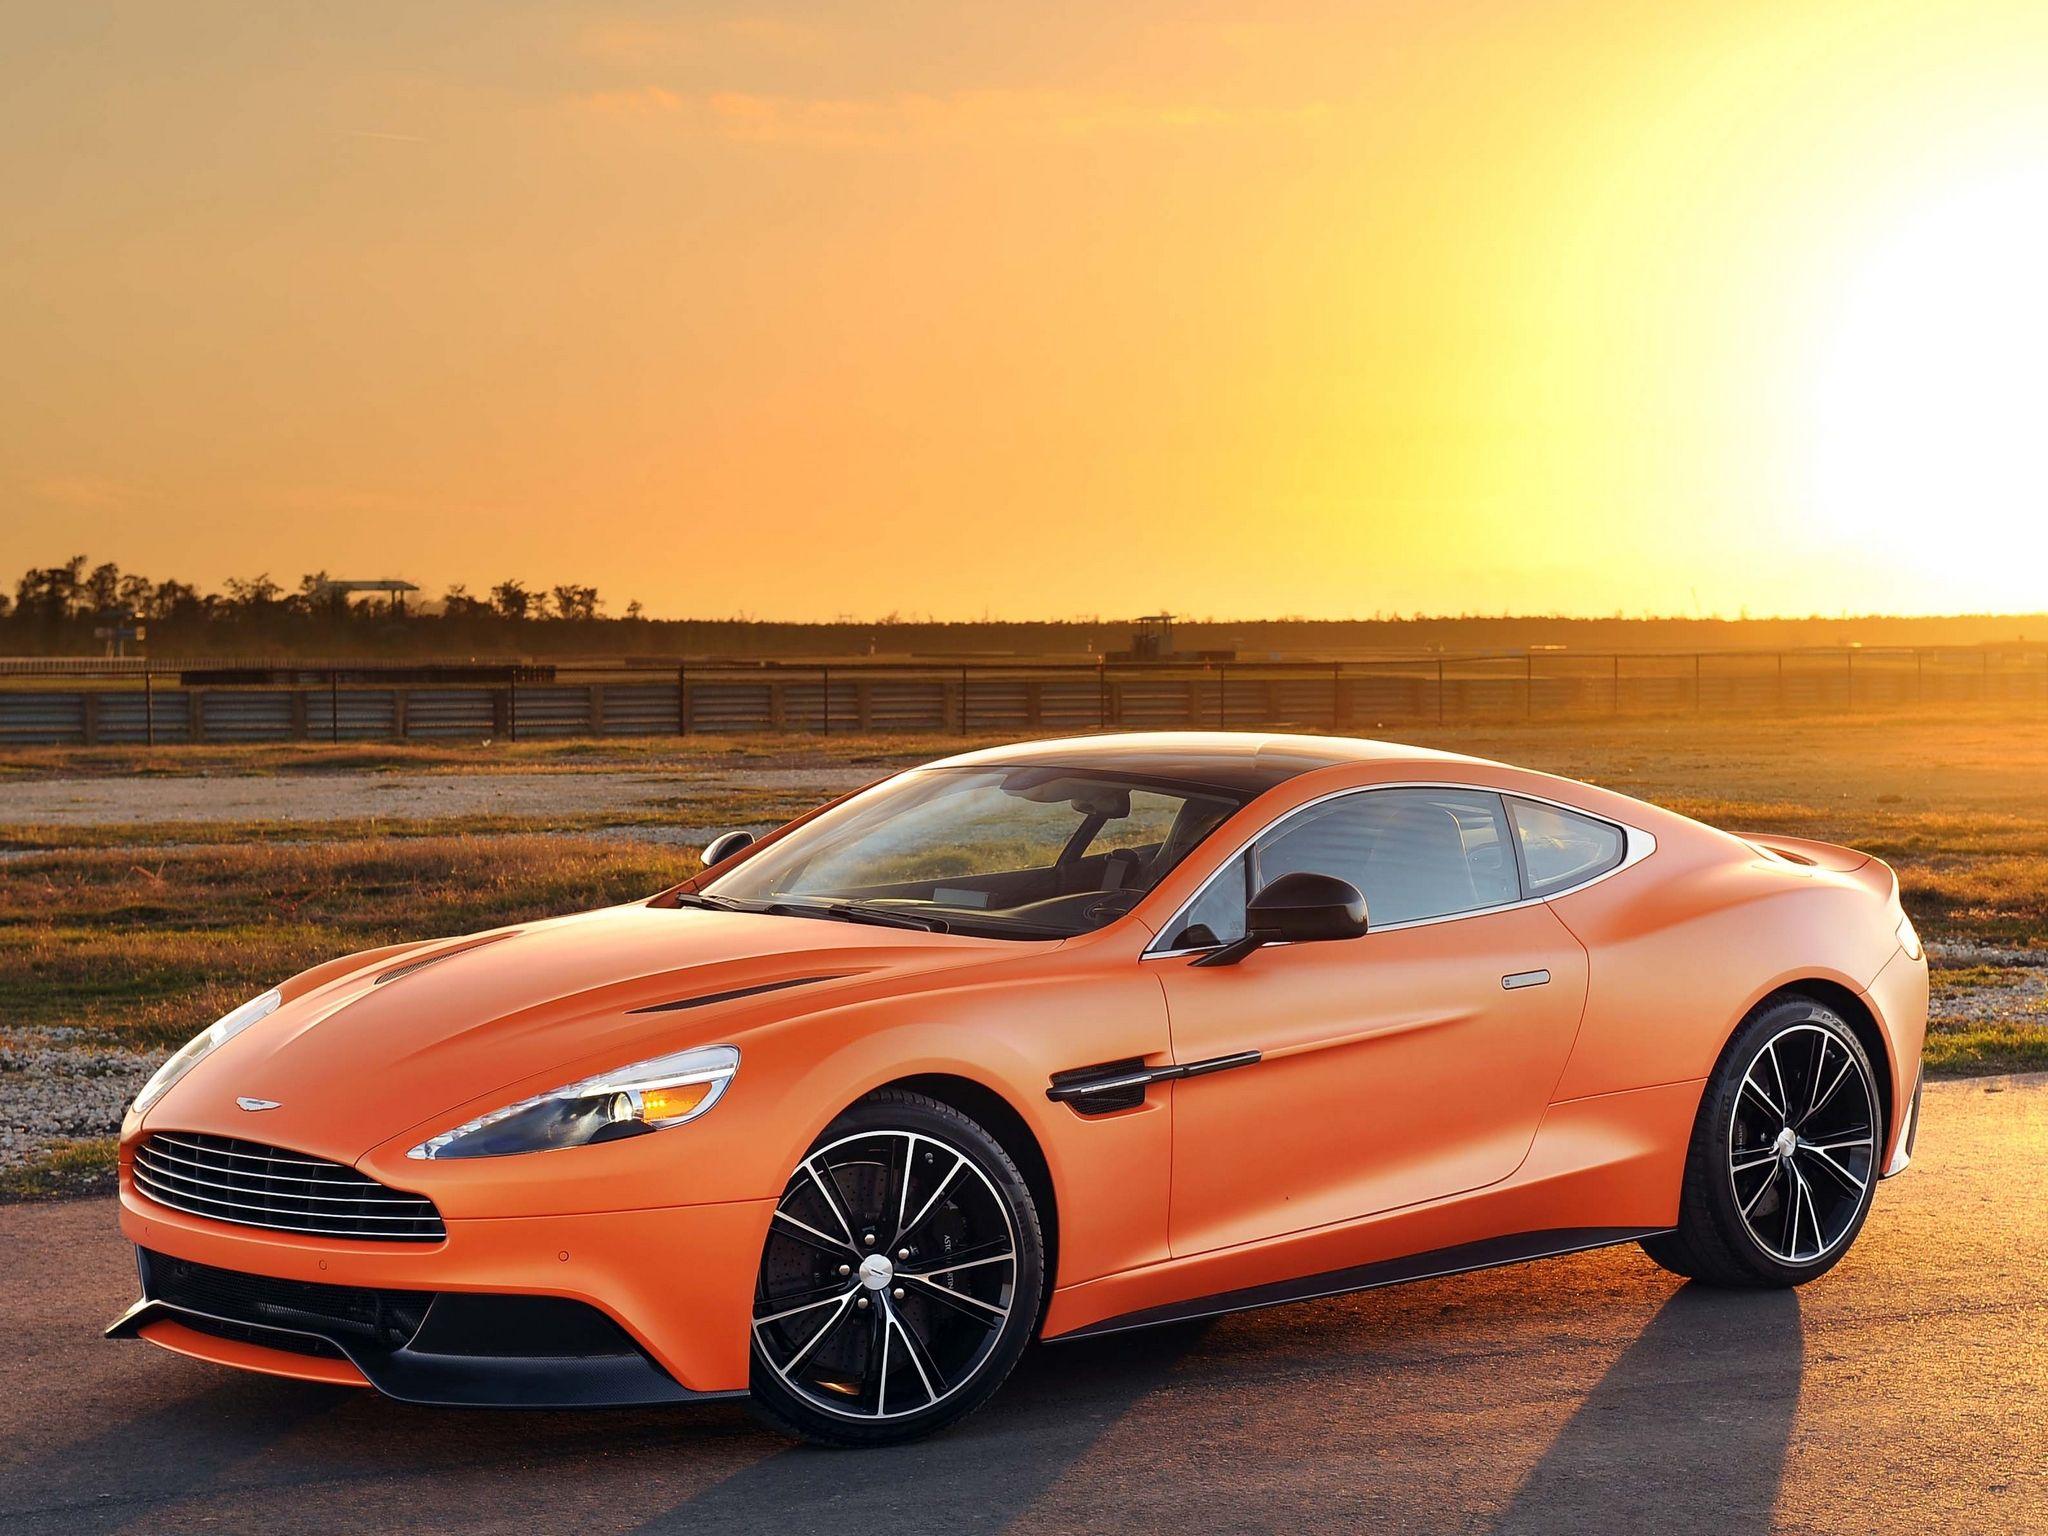 2014 Aston Martin Vanquish In Tangerine Cars